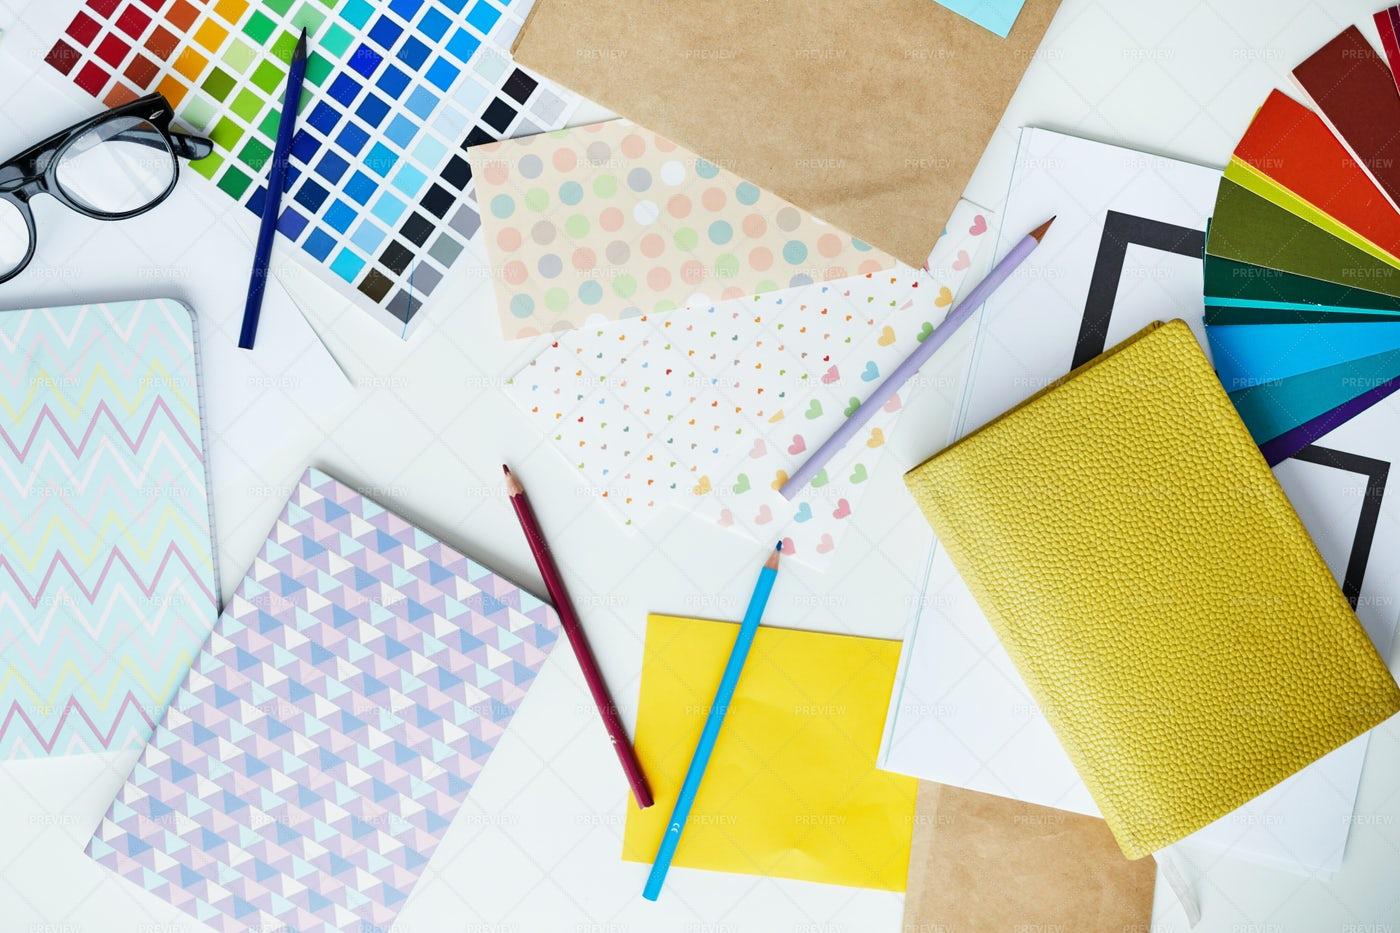 Pastel Office Supplies: Stock Photos